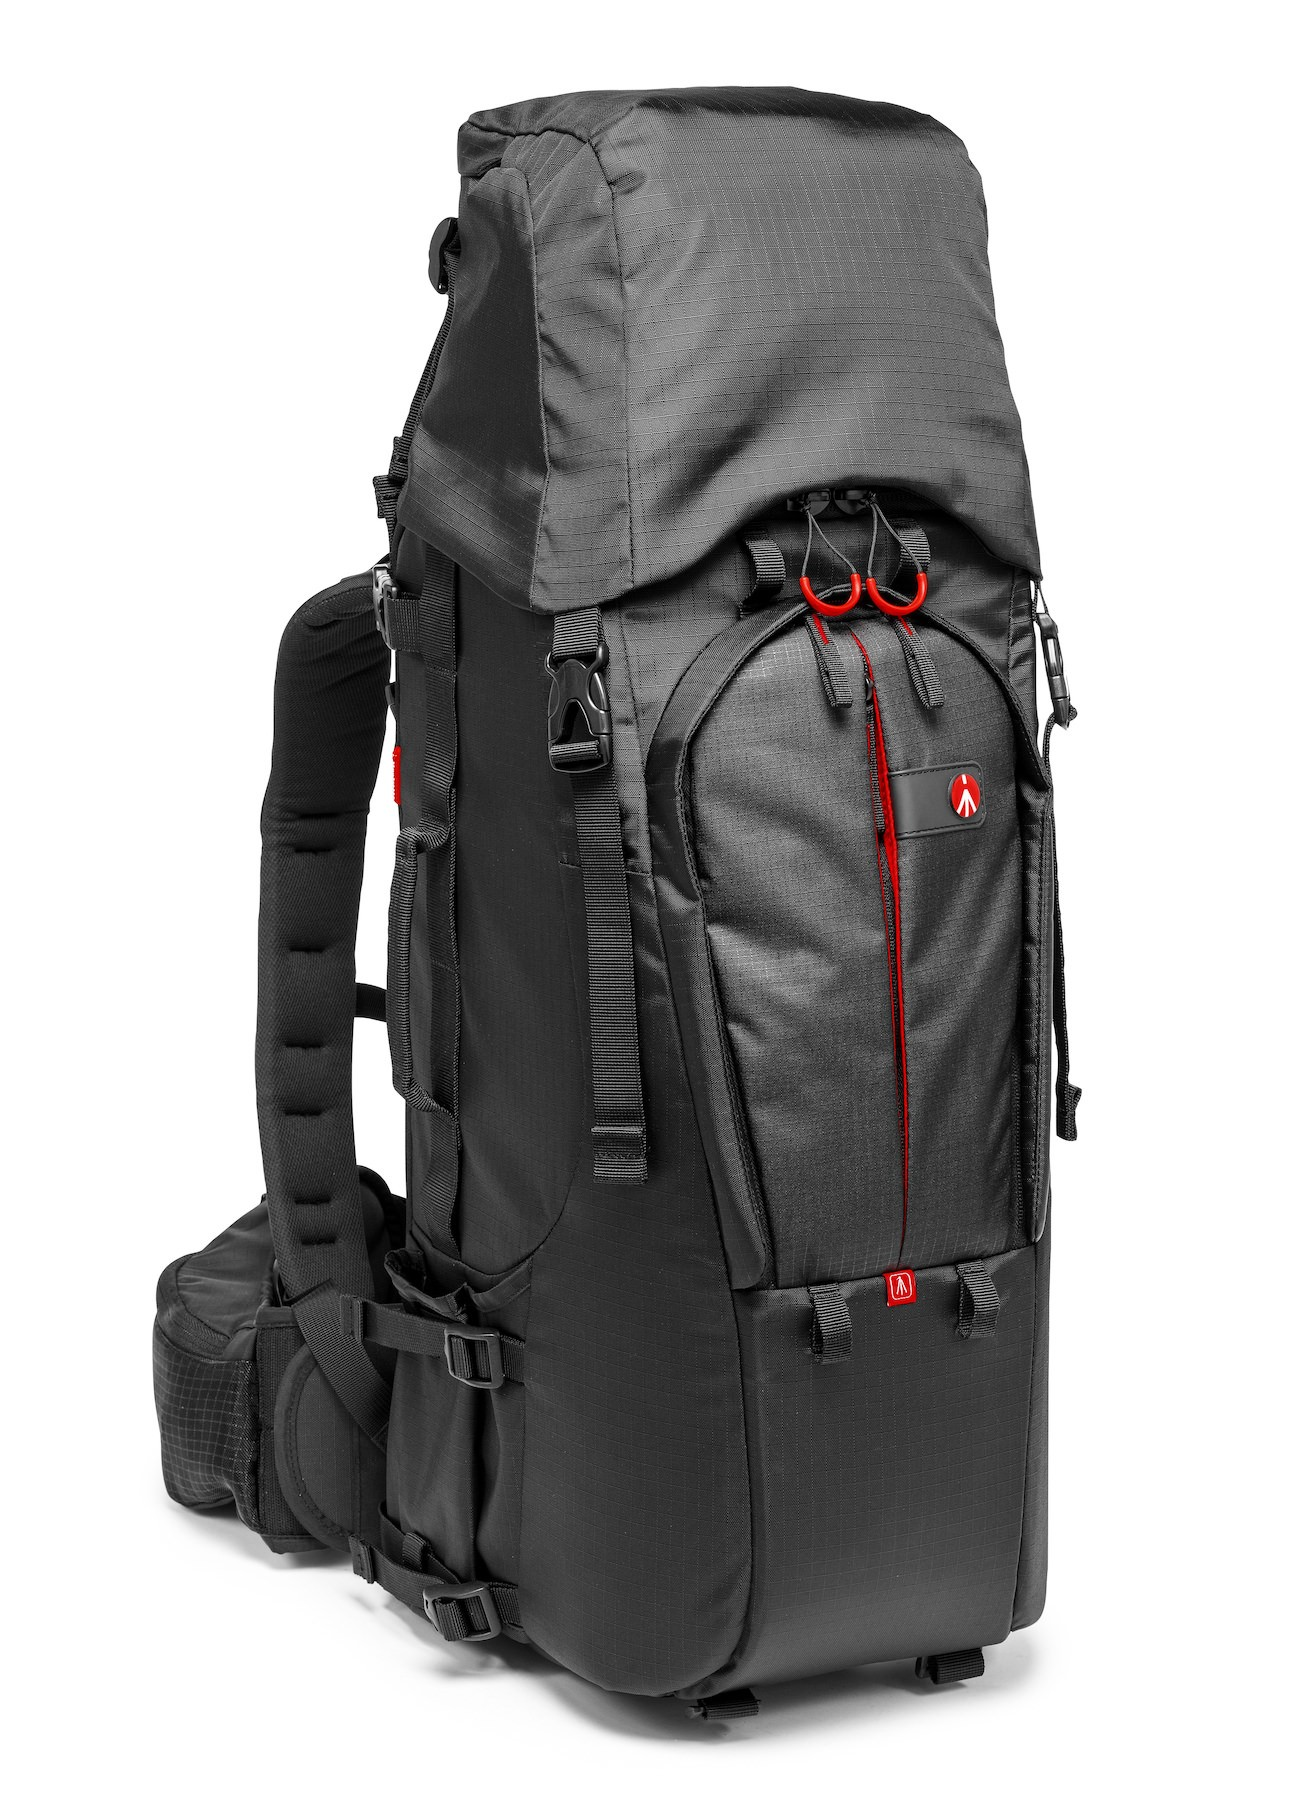 Pro Light camera backpack TLB-